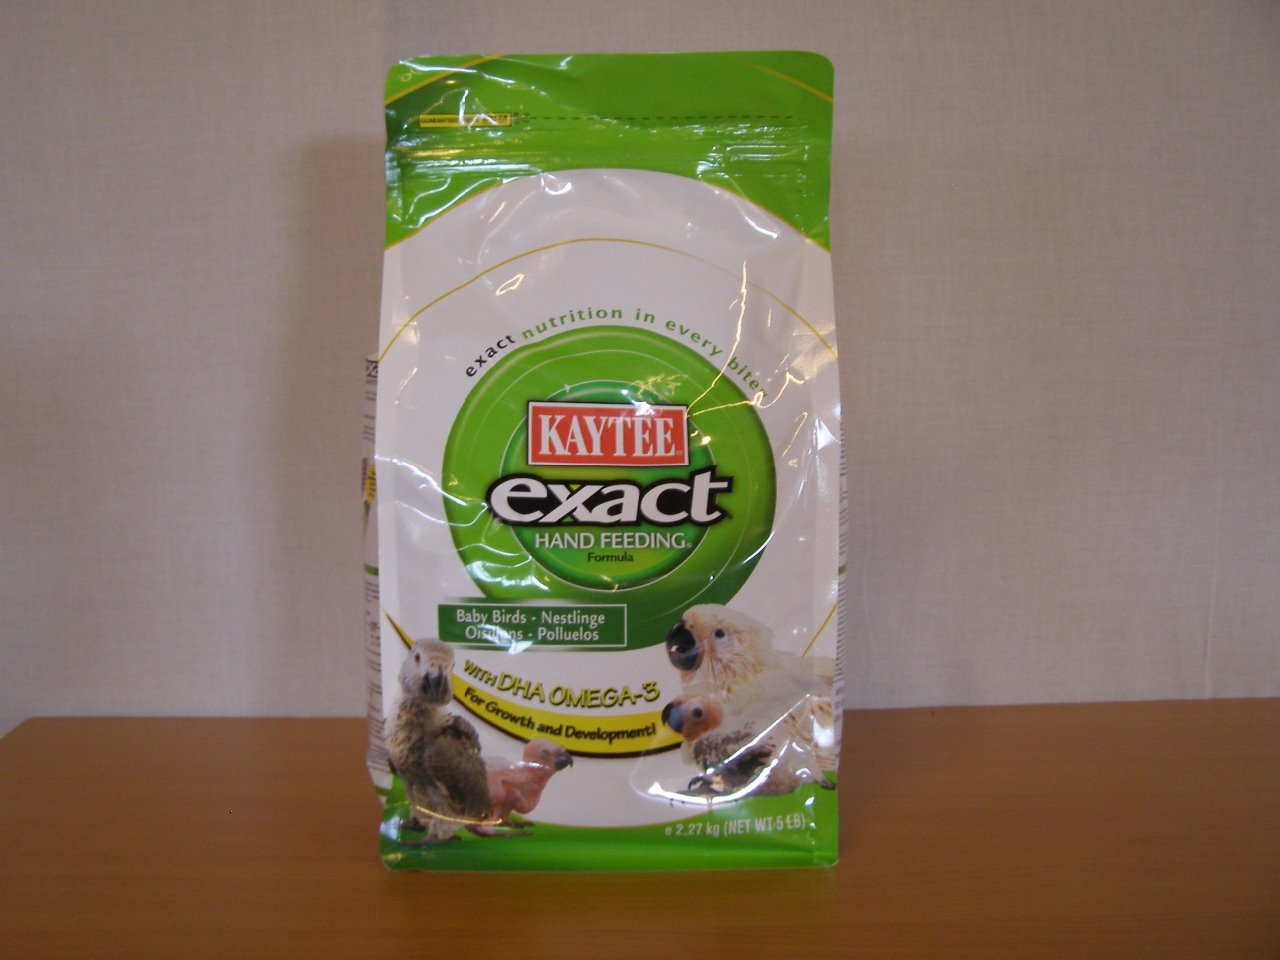 Kaytee Products Dokrmovací směs Exact Hand Feeding All Baby Birds s DHA 2,27 kg